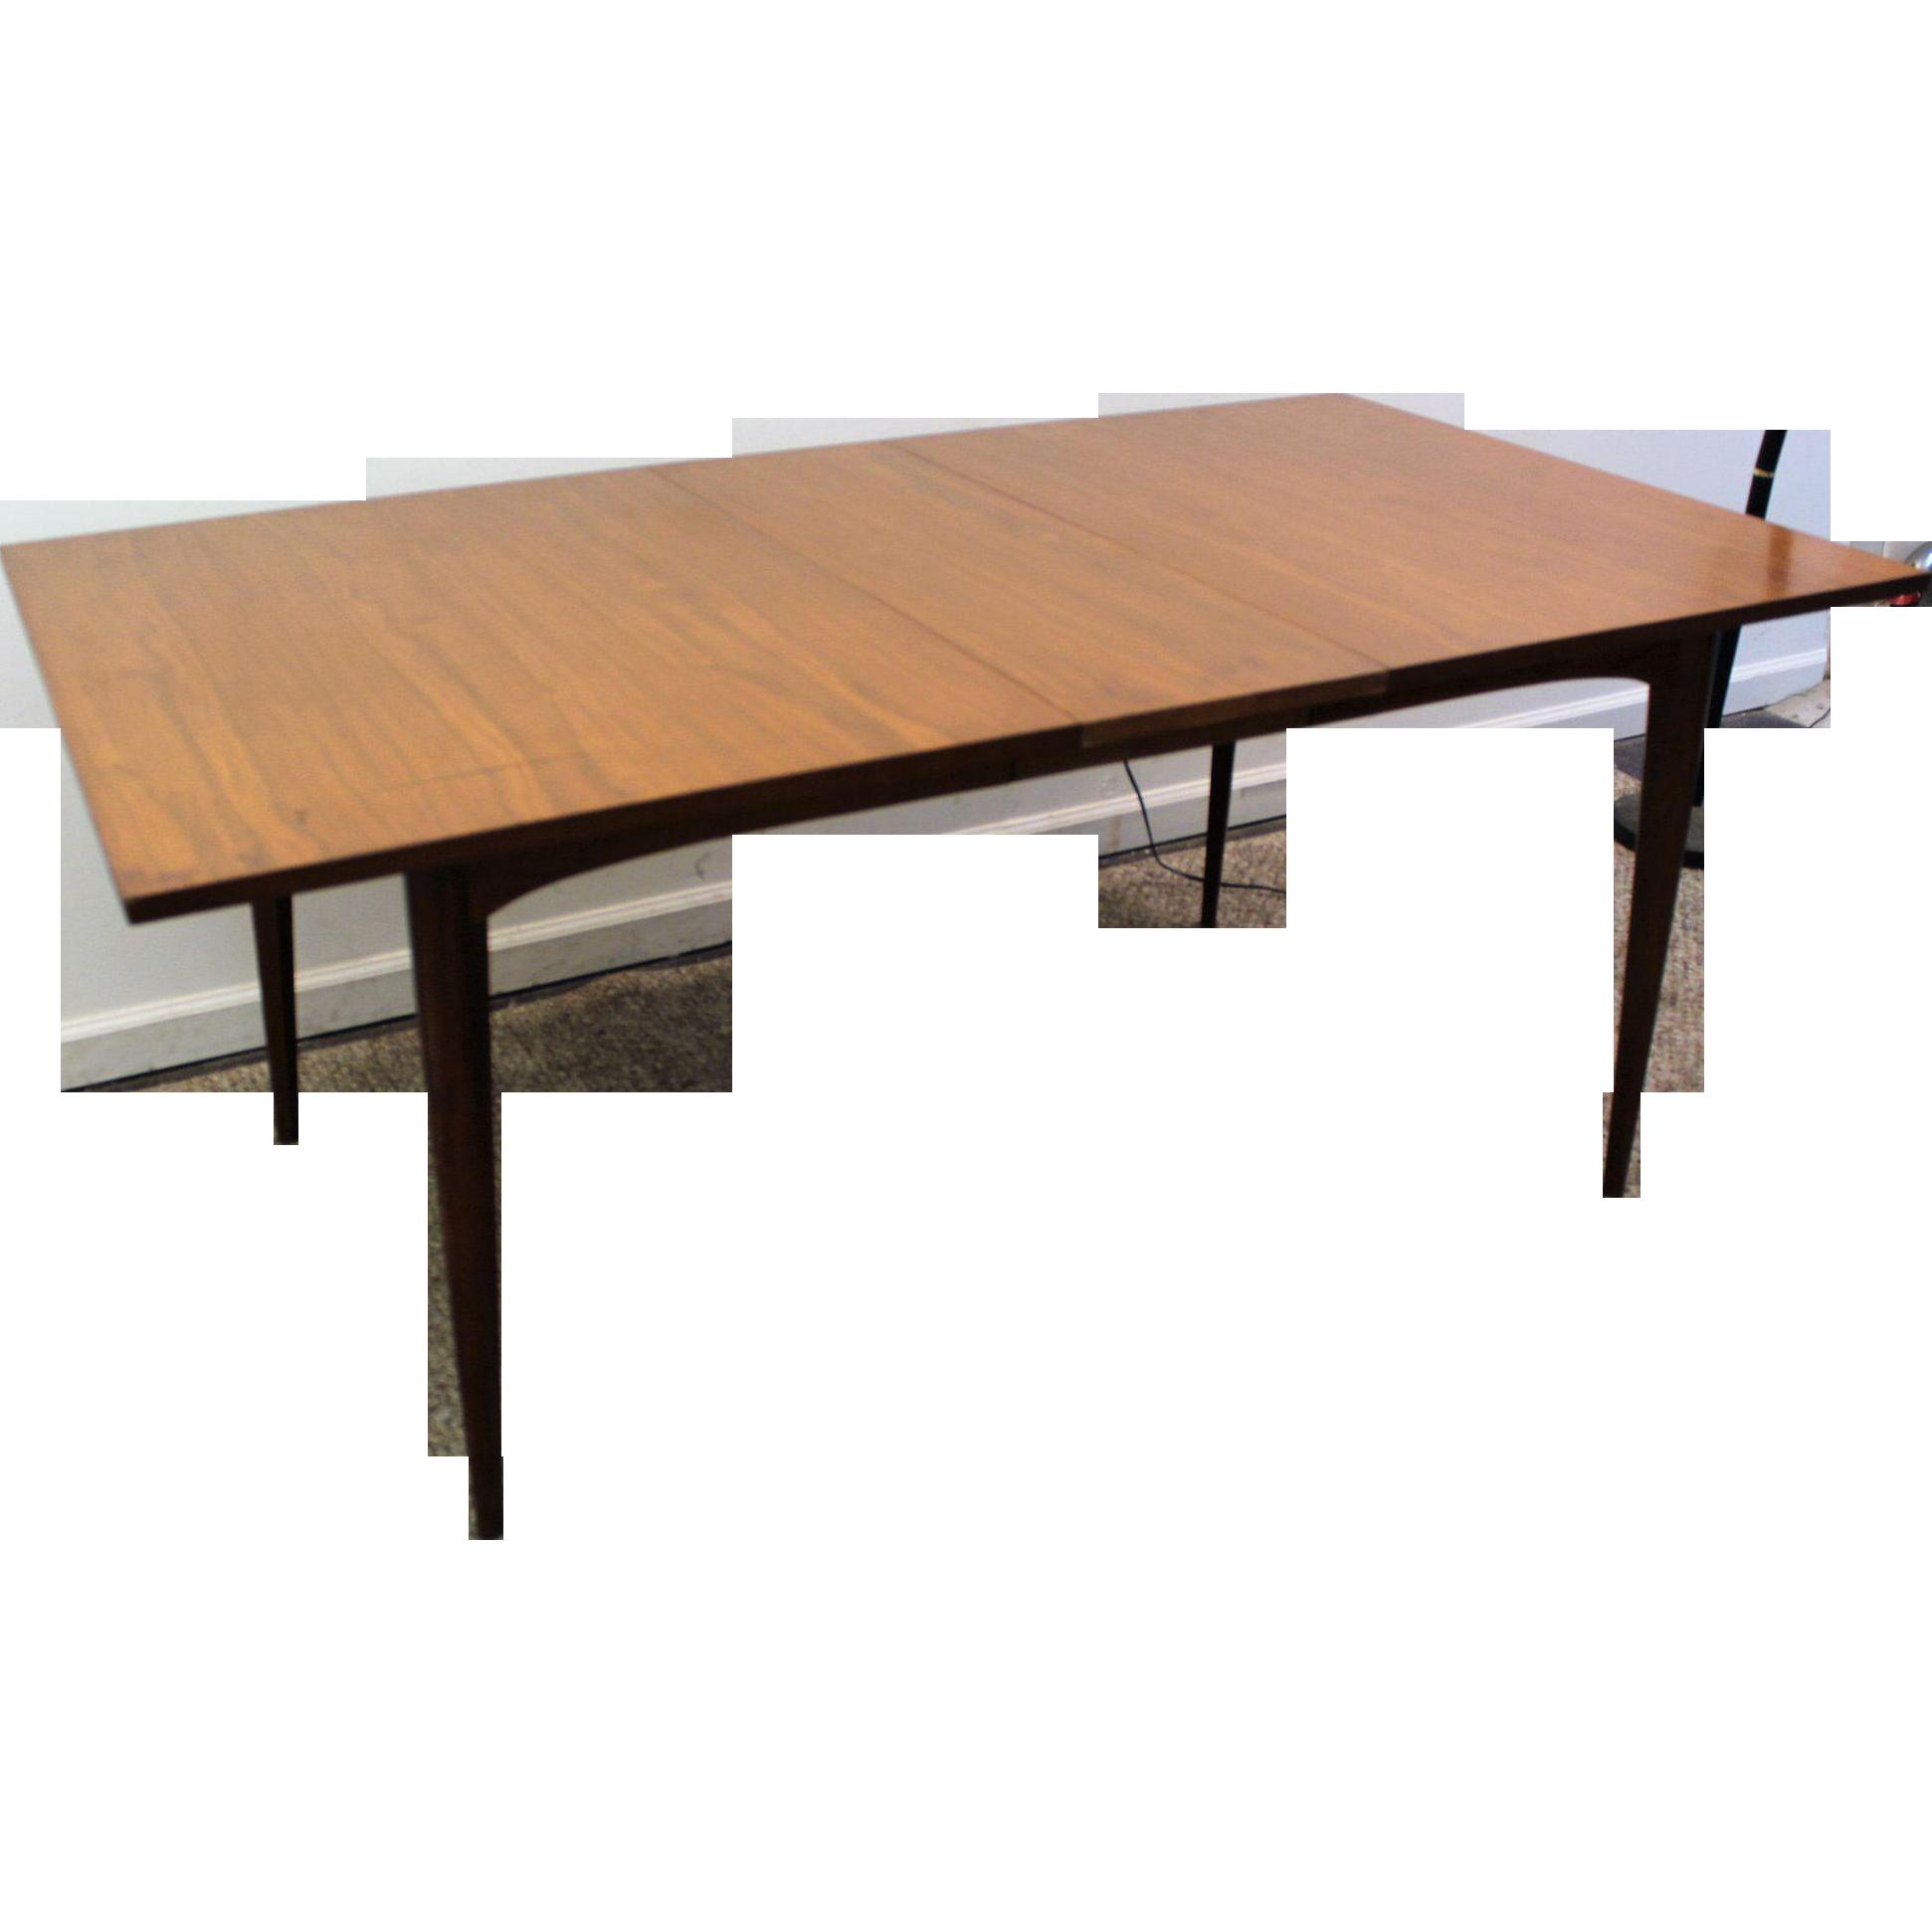 Danish Modern Dining Table Mid Century Danish Modern Walnut Surfboard Dining Table W